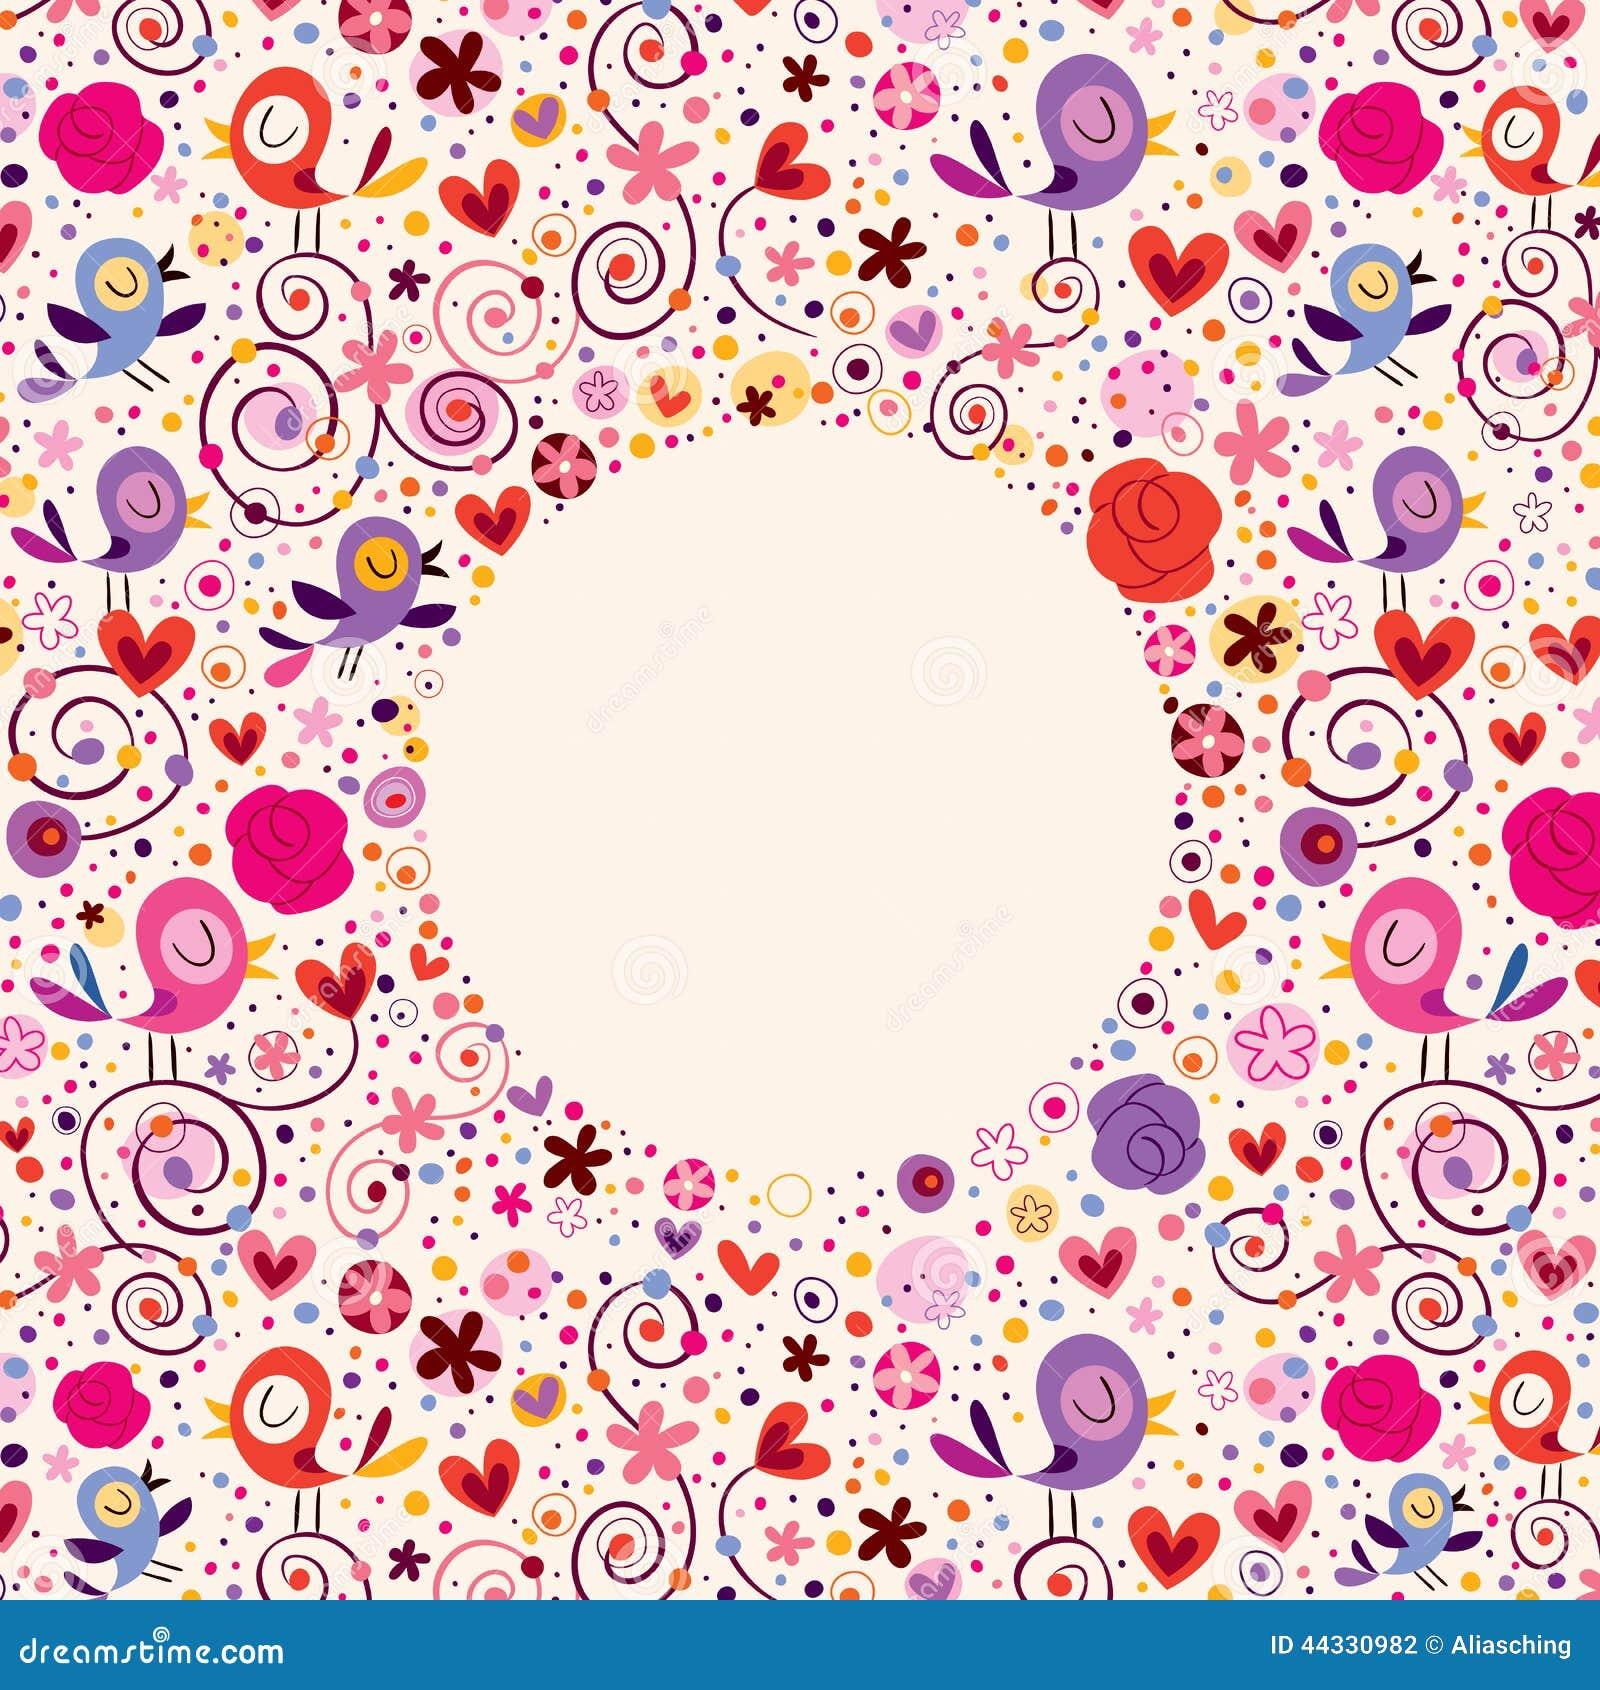 Flowers, hearts, birds love nature circle frame design element.